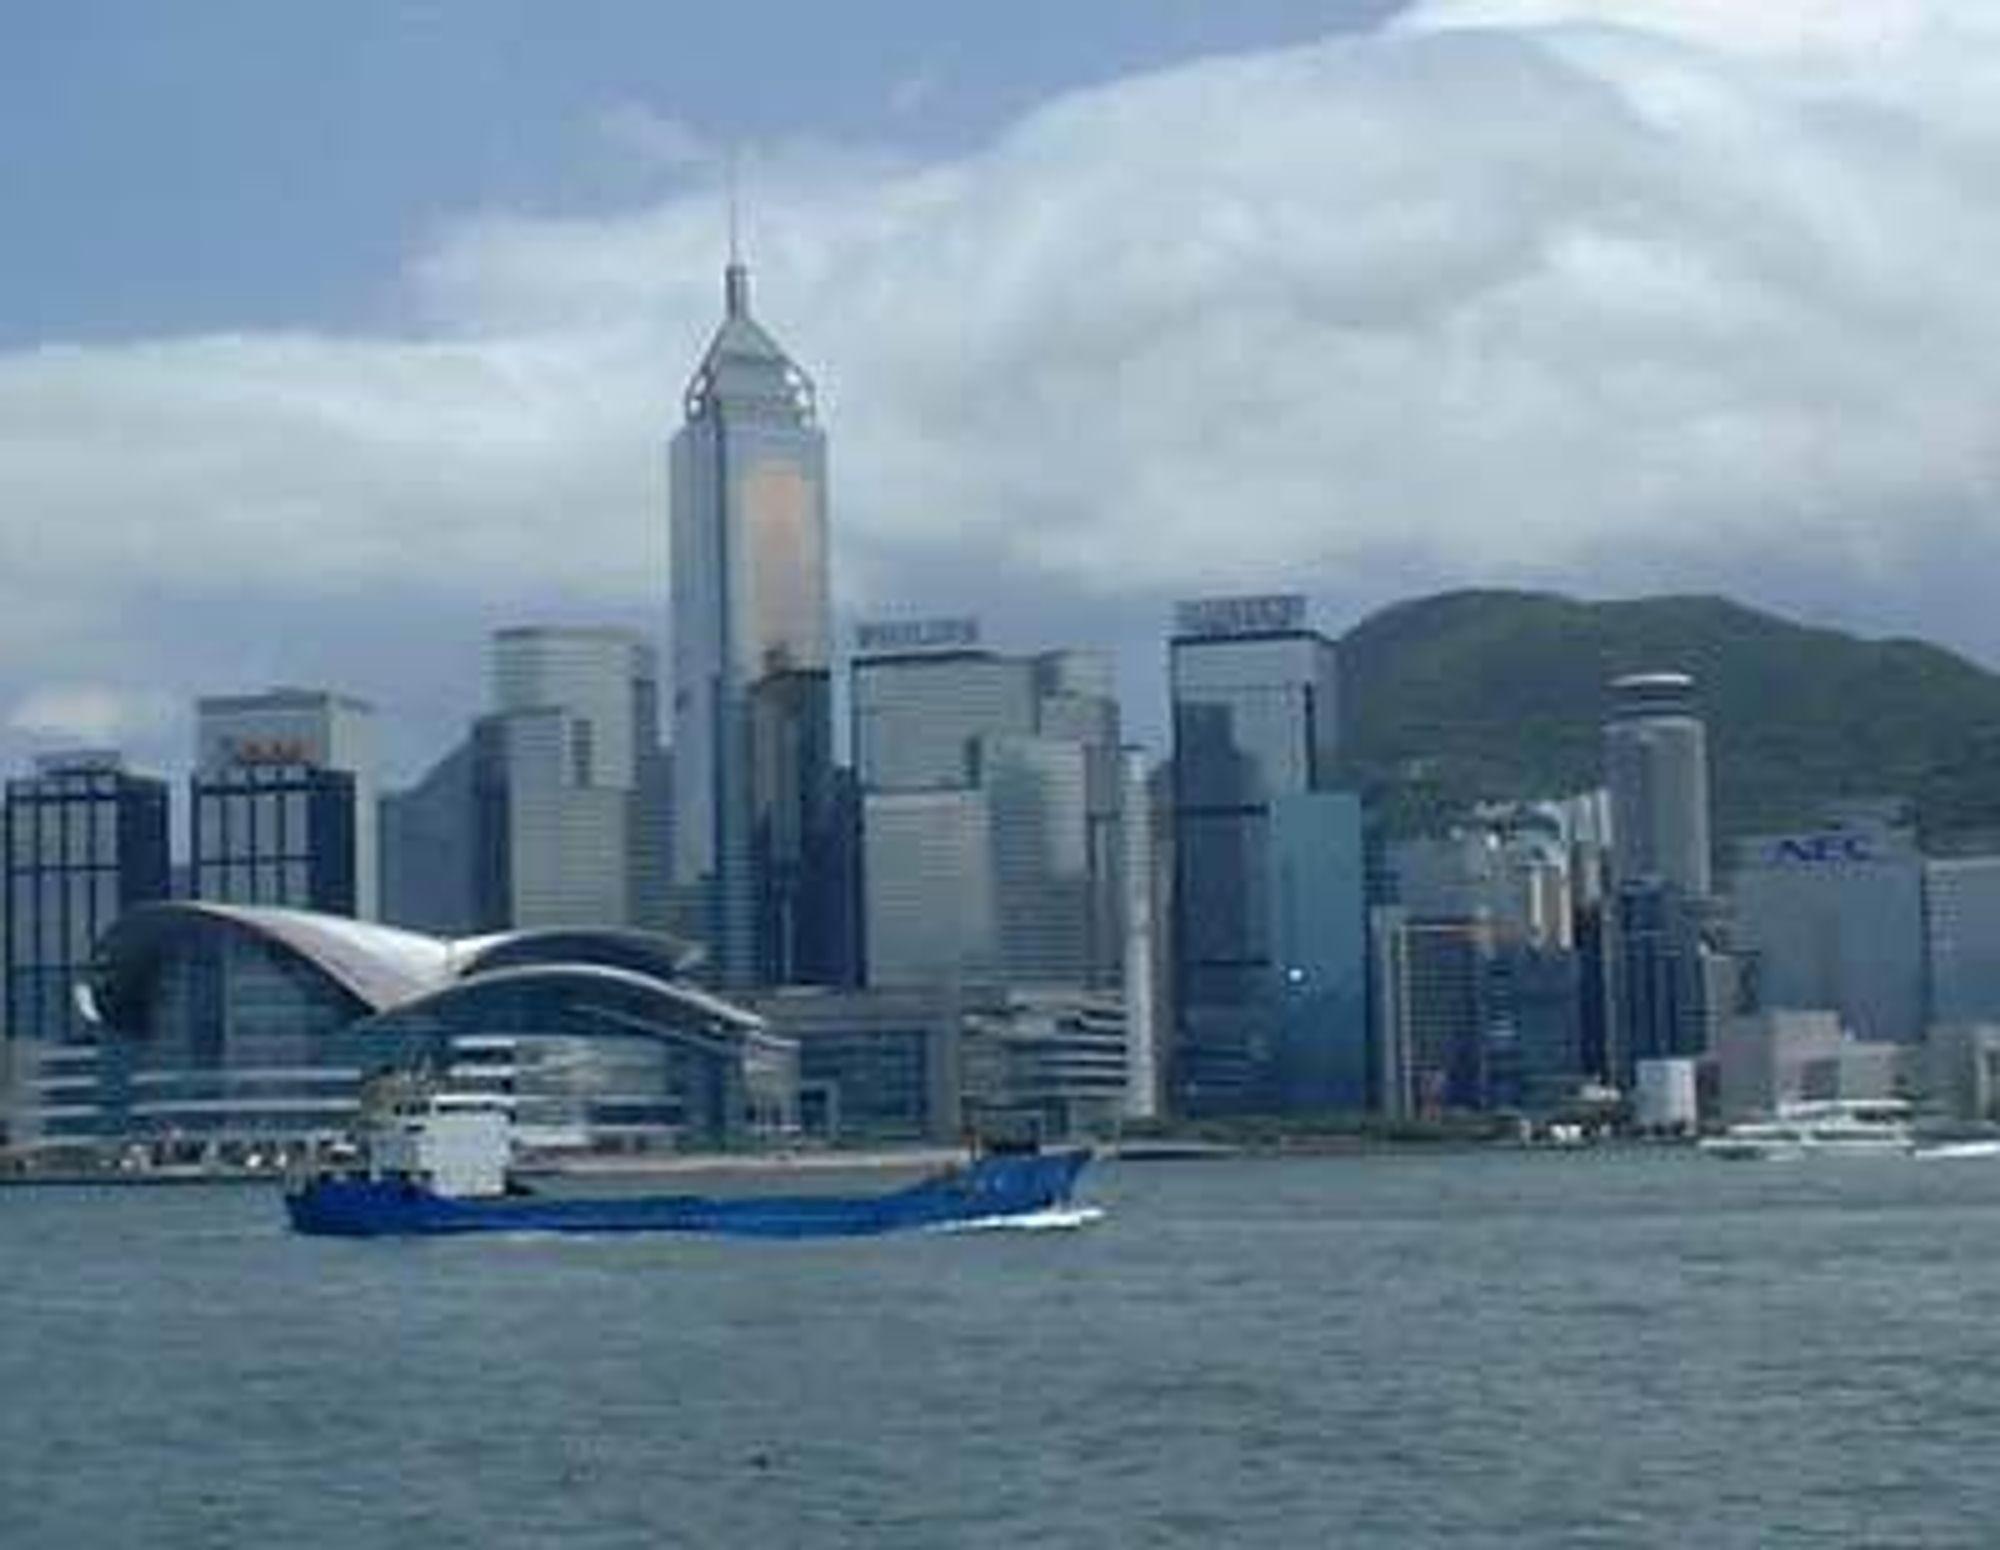 Hong Kong, kina. Skyskrapere sett fra sjøen, med lasteskip foran